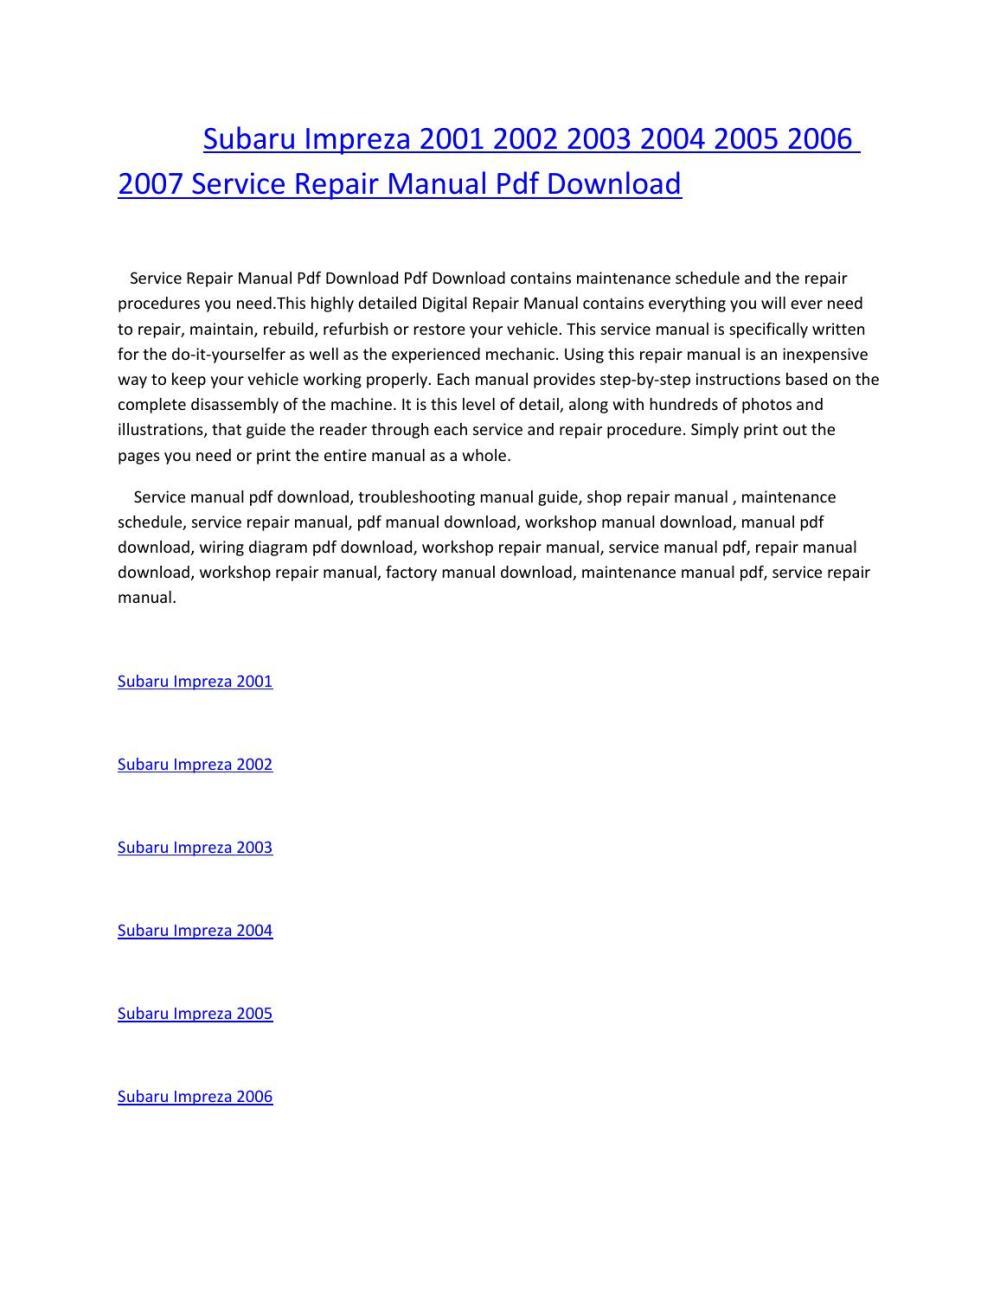 medium resolution of subaru impreza 2001 2002 2003 2004 2005 2006 2007 service repair manual pdf download by amurgului issuu